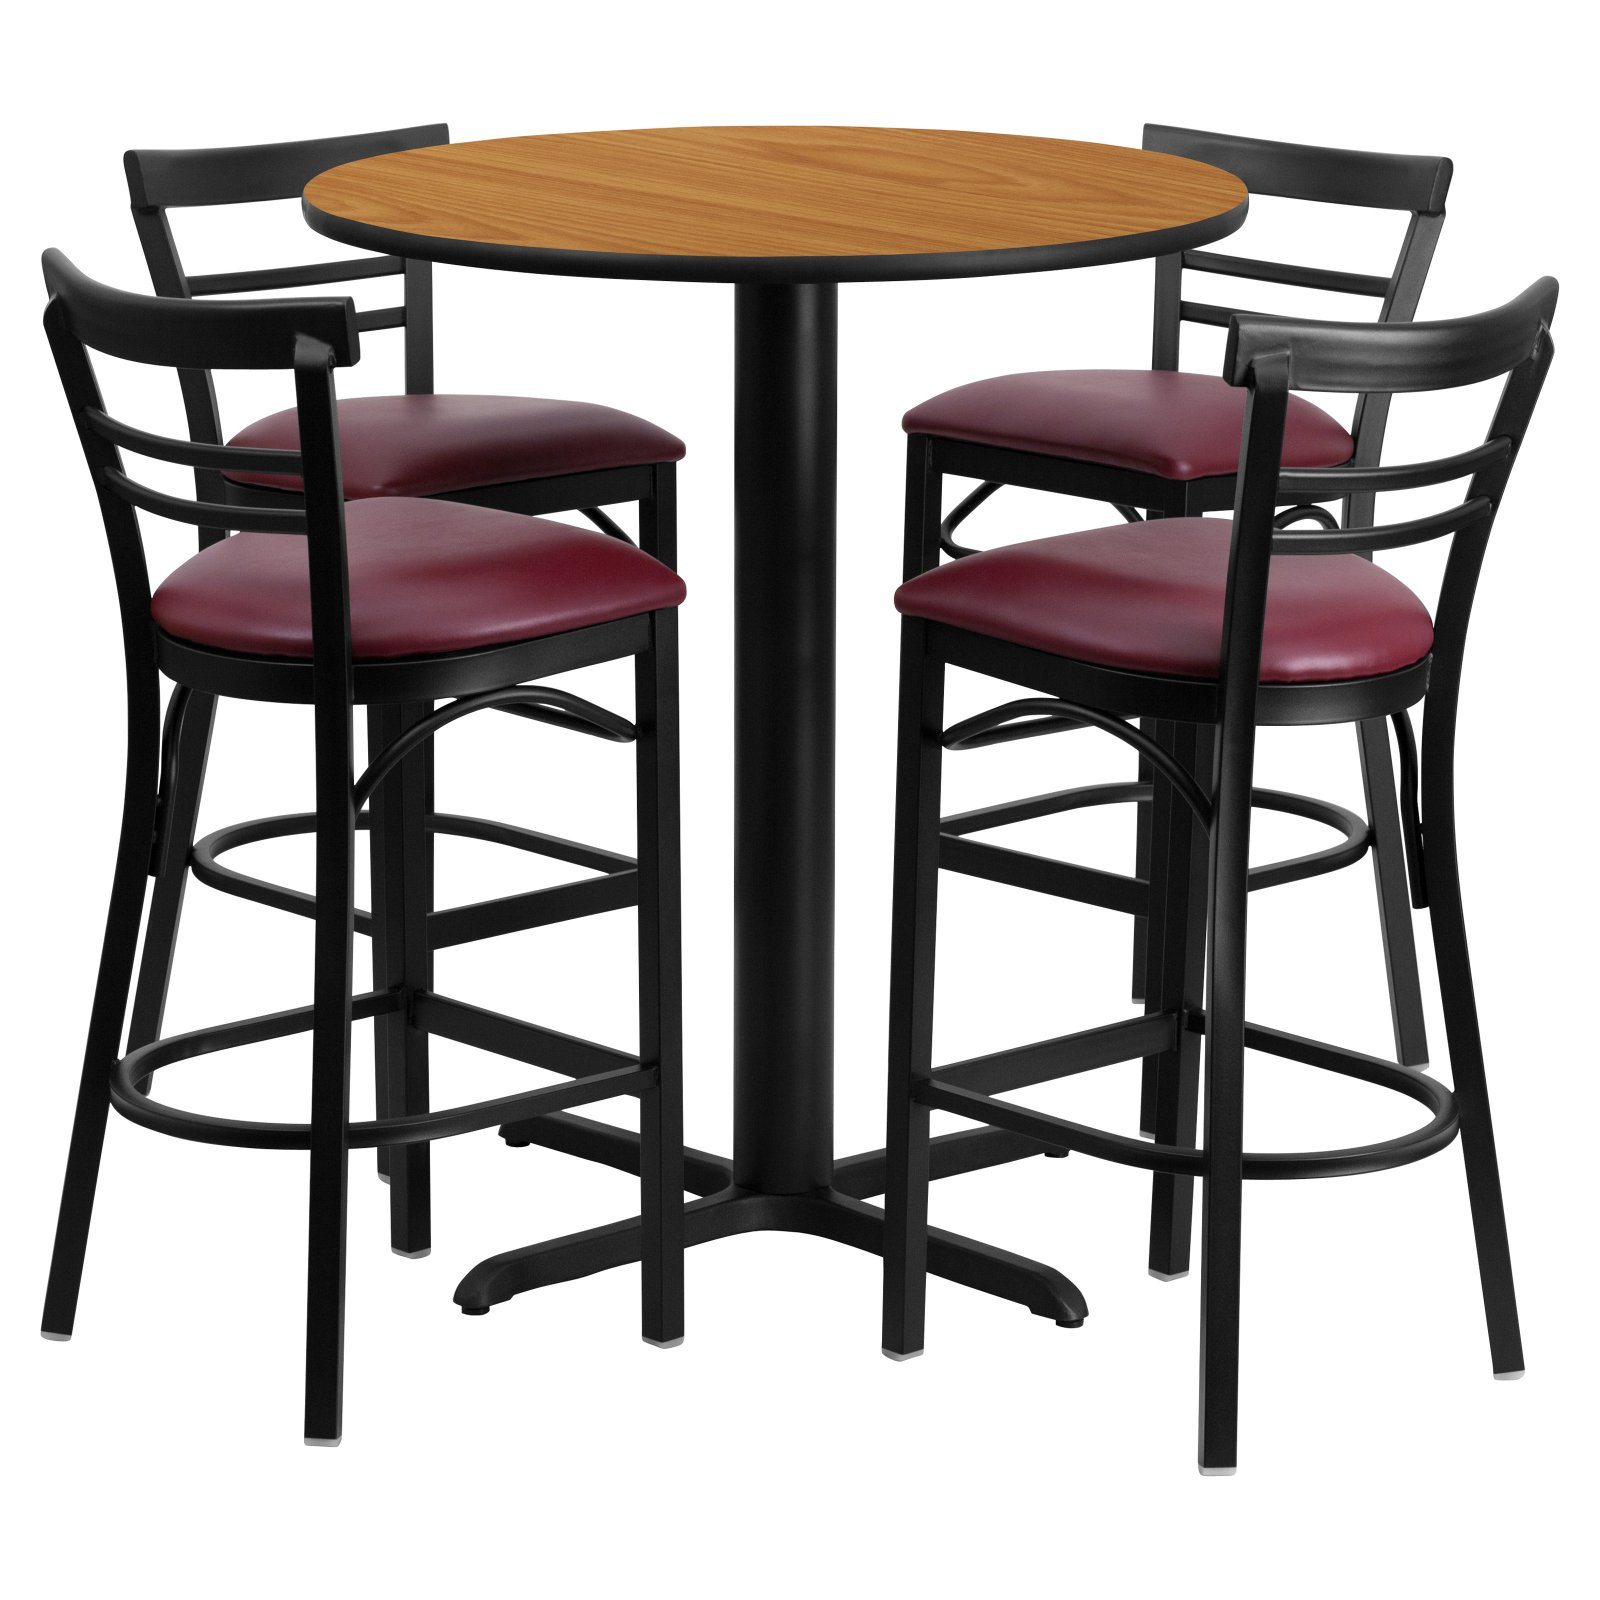 Flash Furniture 24'' Round Natural Laminate Table Set with 4 Ladder Back Metal Barstools, Burgundy Vinyl Seat Black, Burgundy, Natural